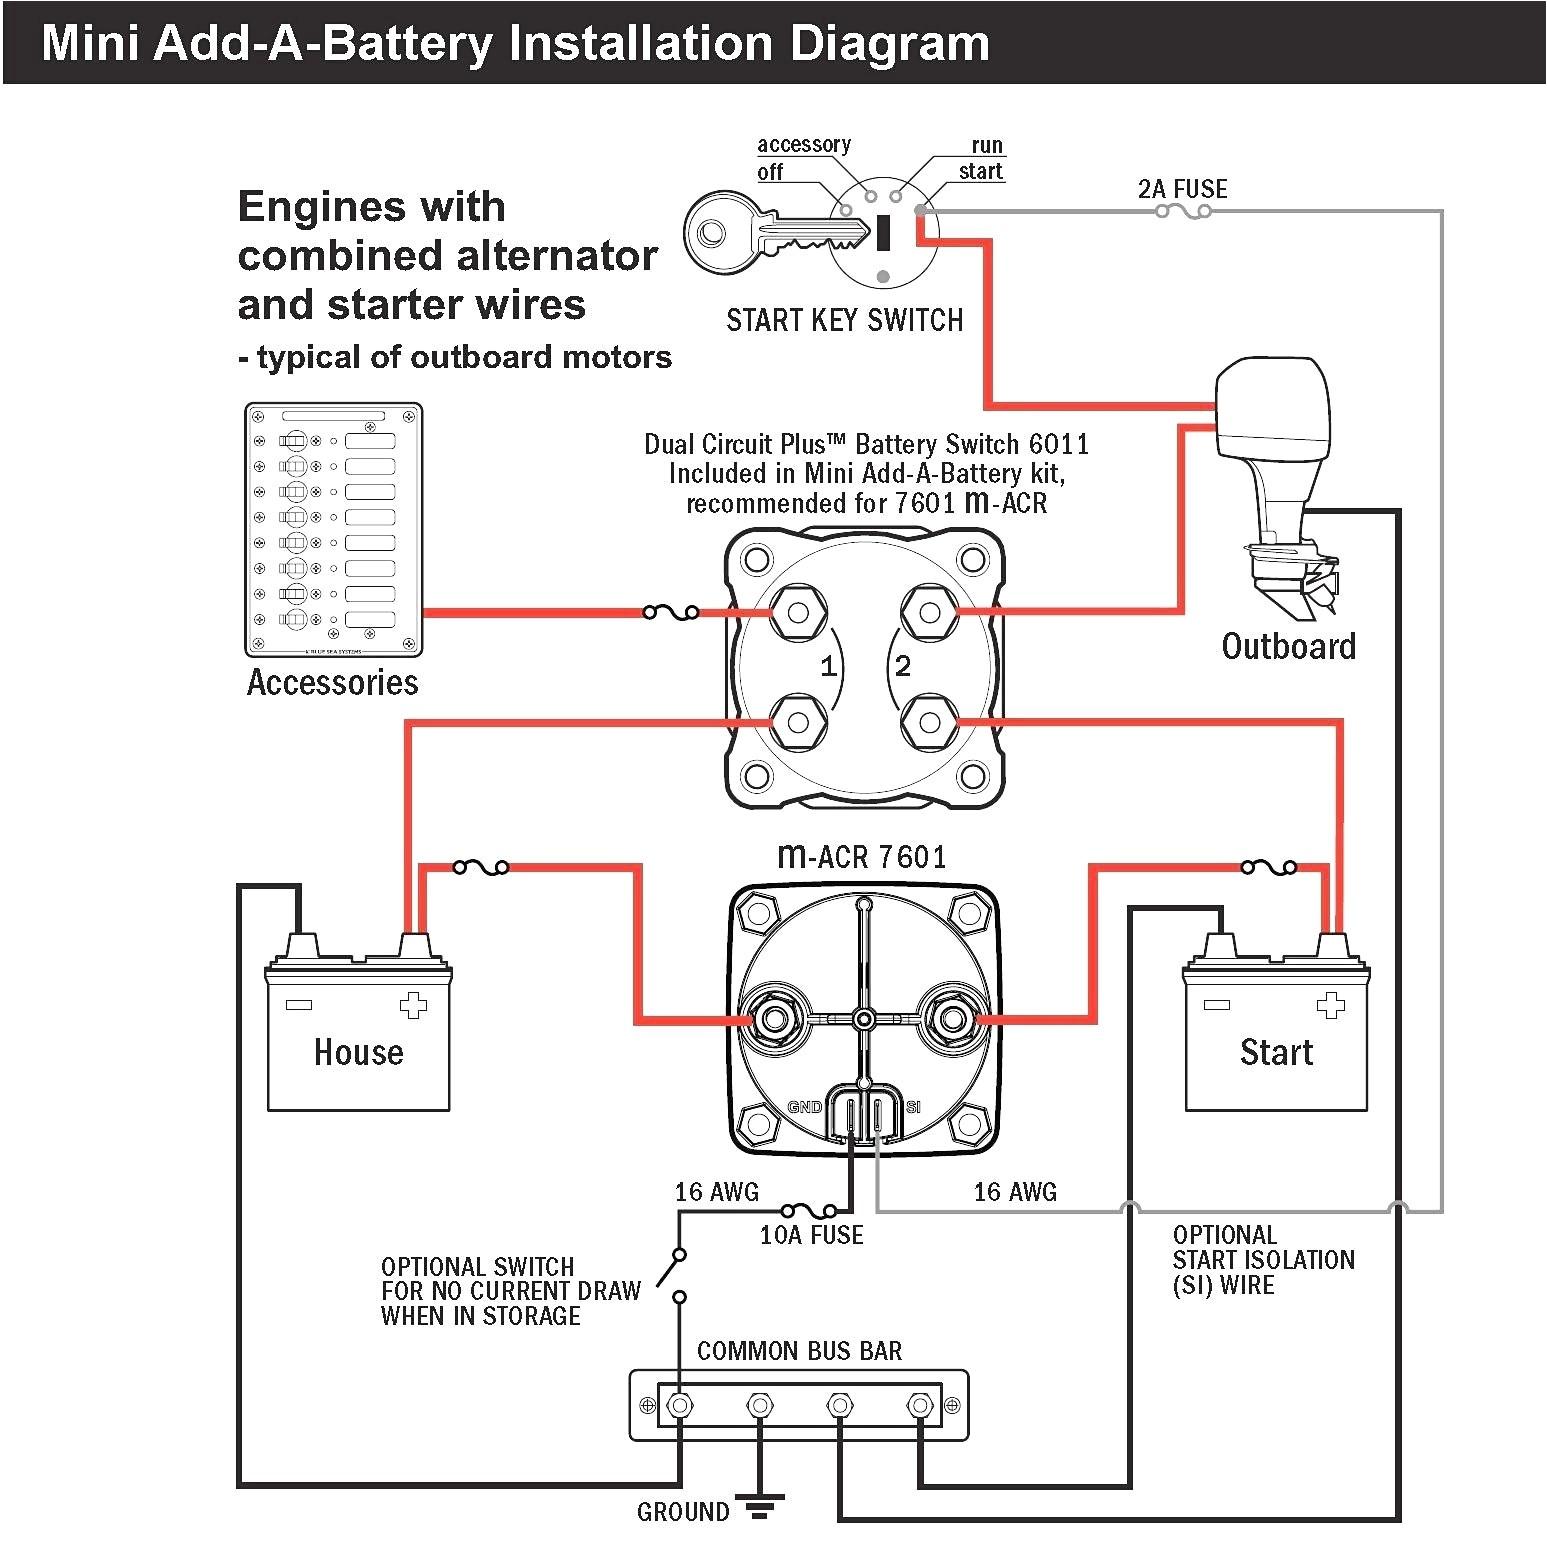 monaco rv wiring diagram u2013 wallpapermonaco rv wiring diagram holiday rambler wiring schematic